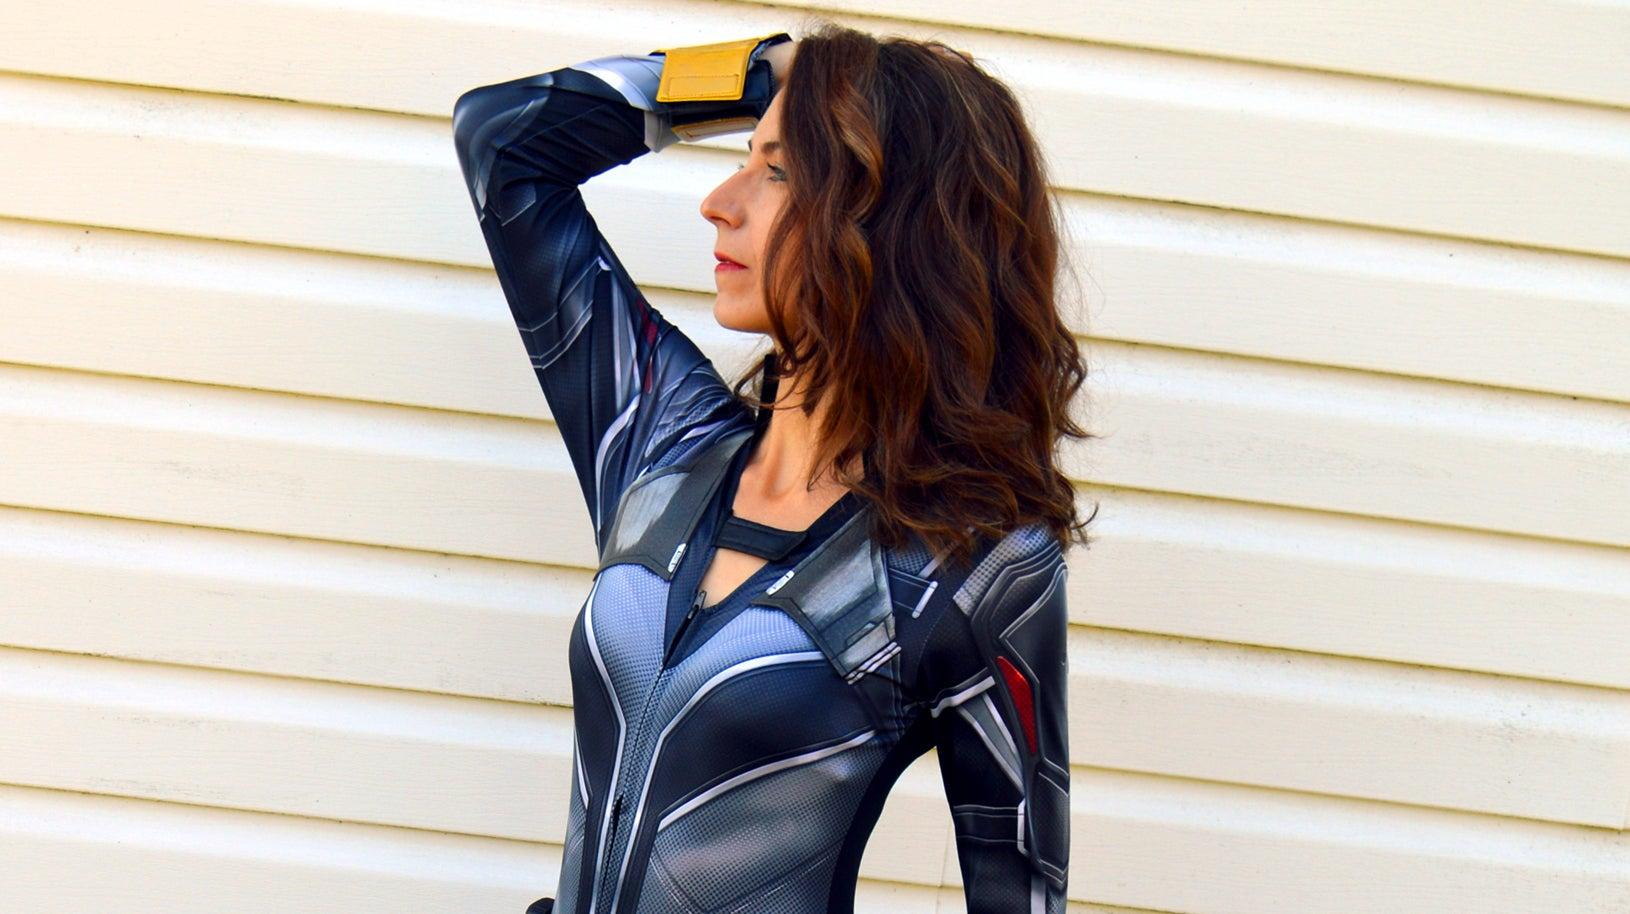 Plexi Cosplay in a Black Widow cosplay